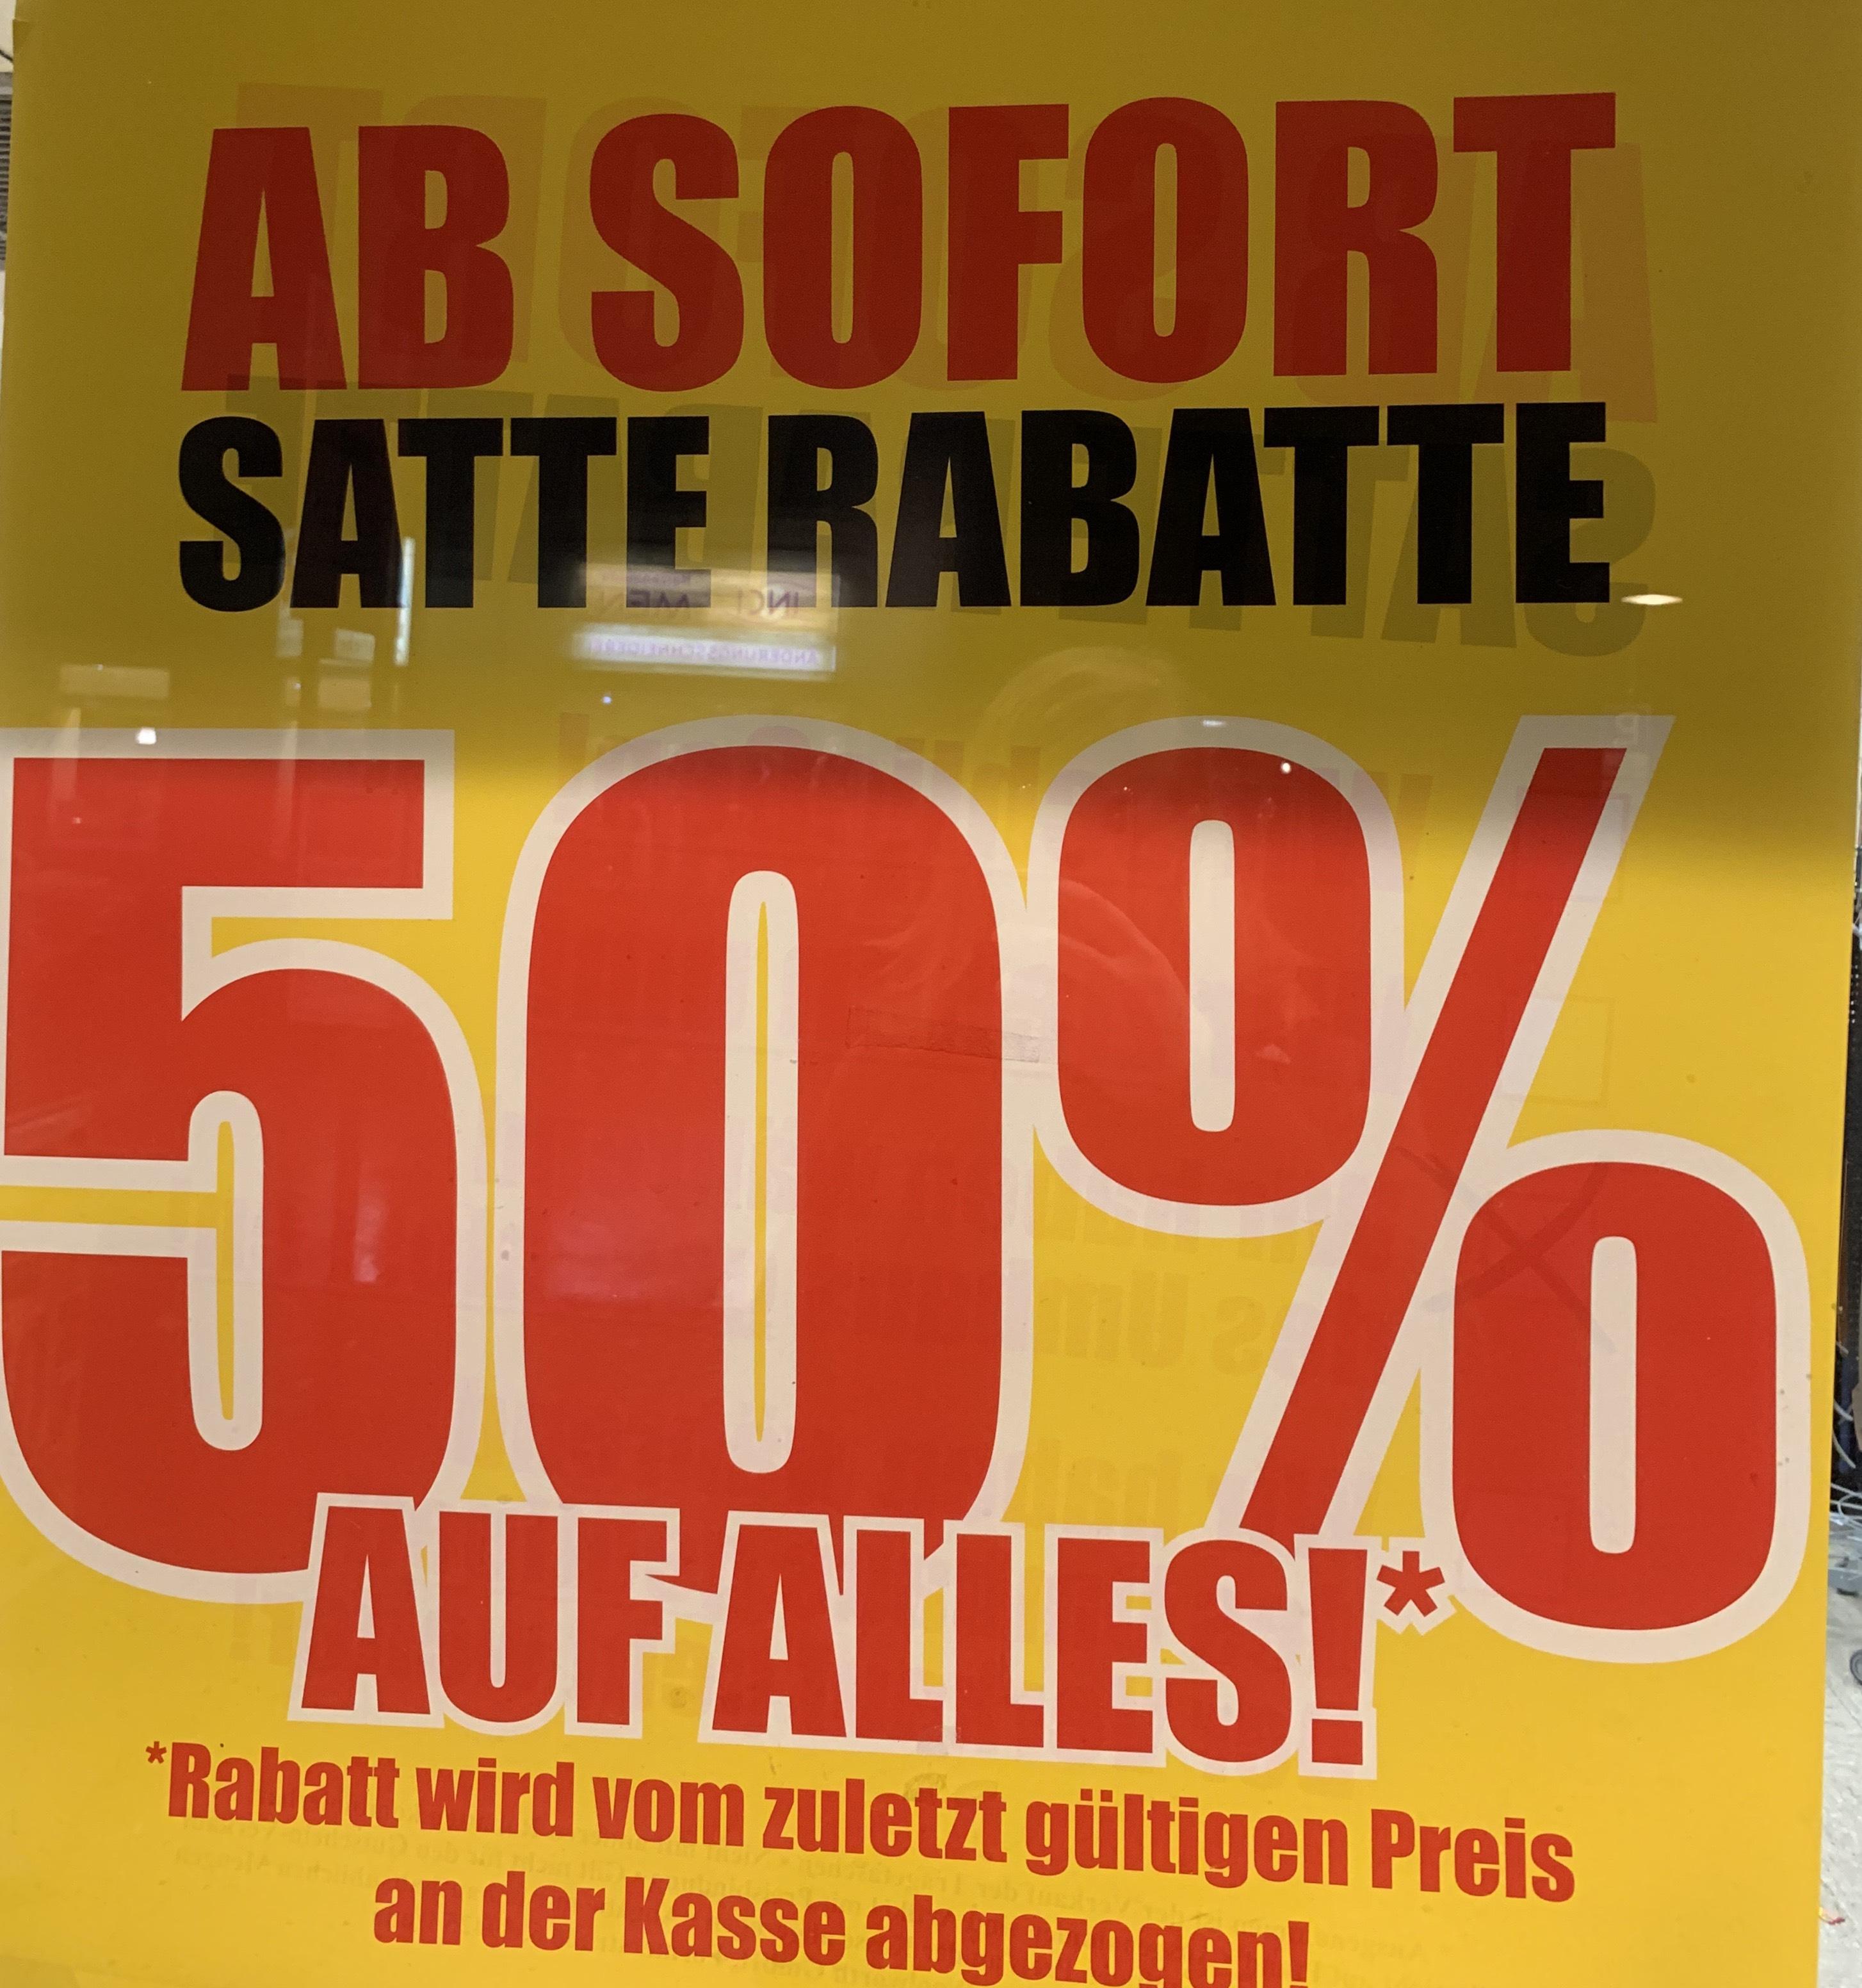 Woolworth [Lokal Stolberg Rhld] 50% auf alles wegen Umbauarbeiten